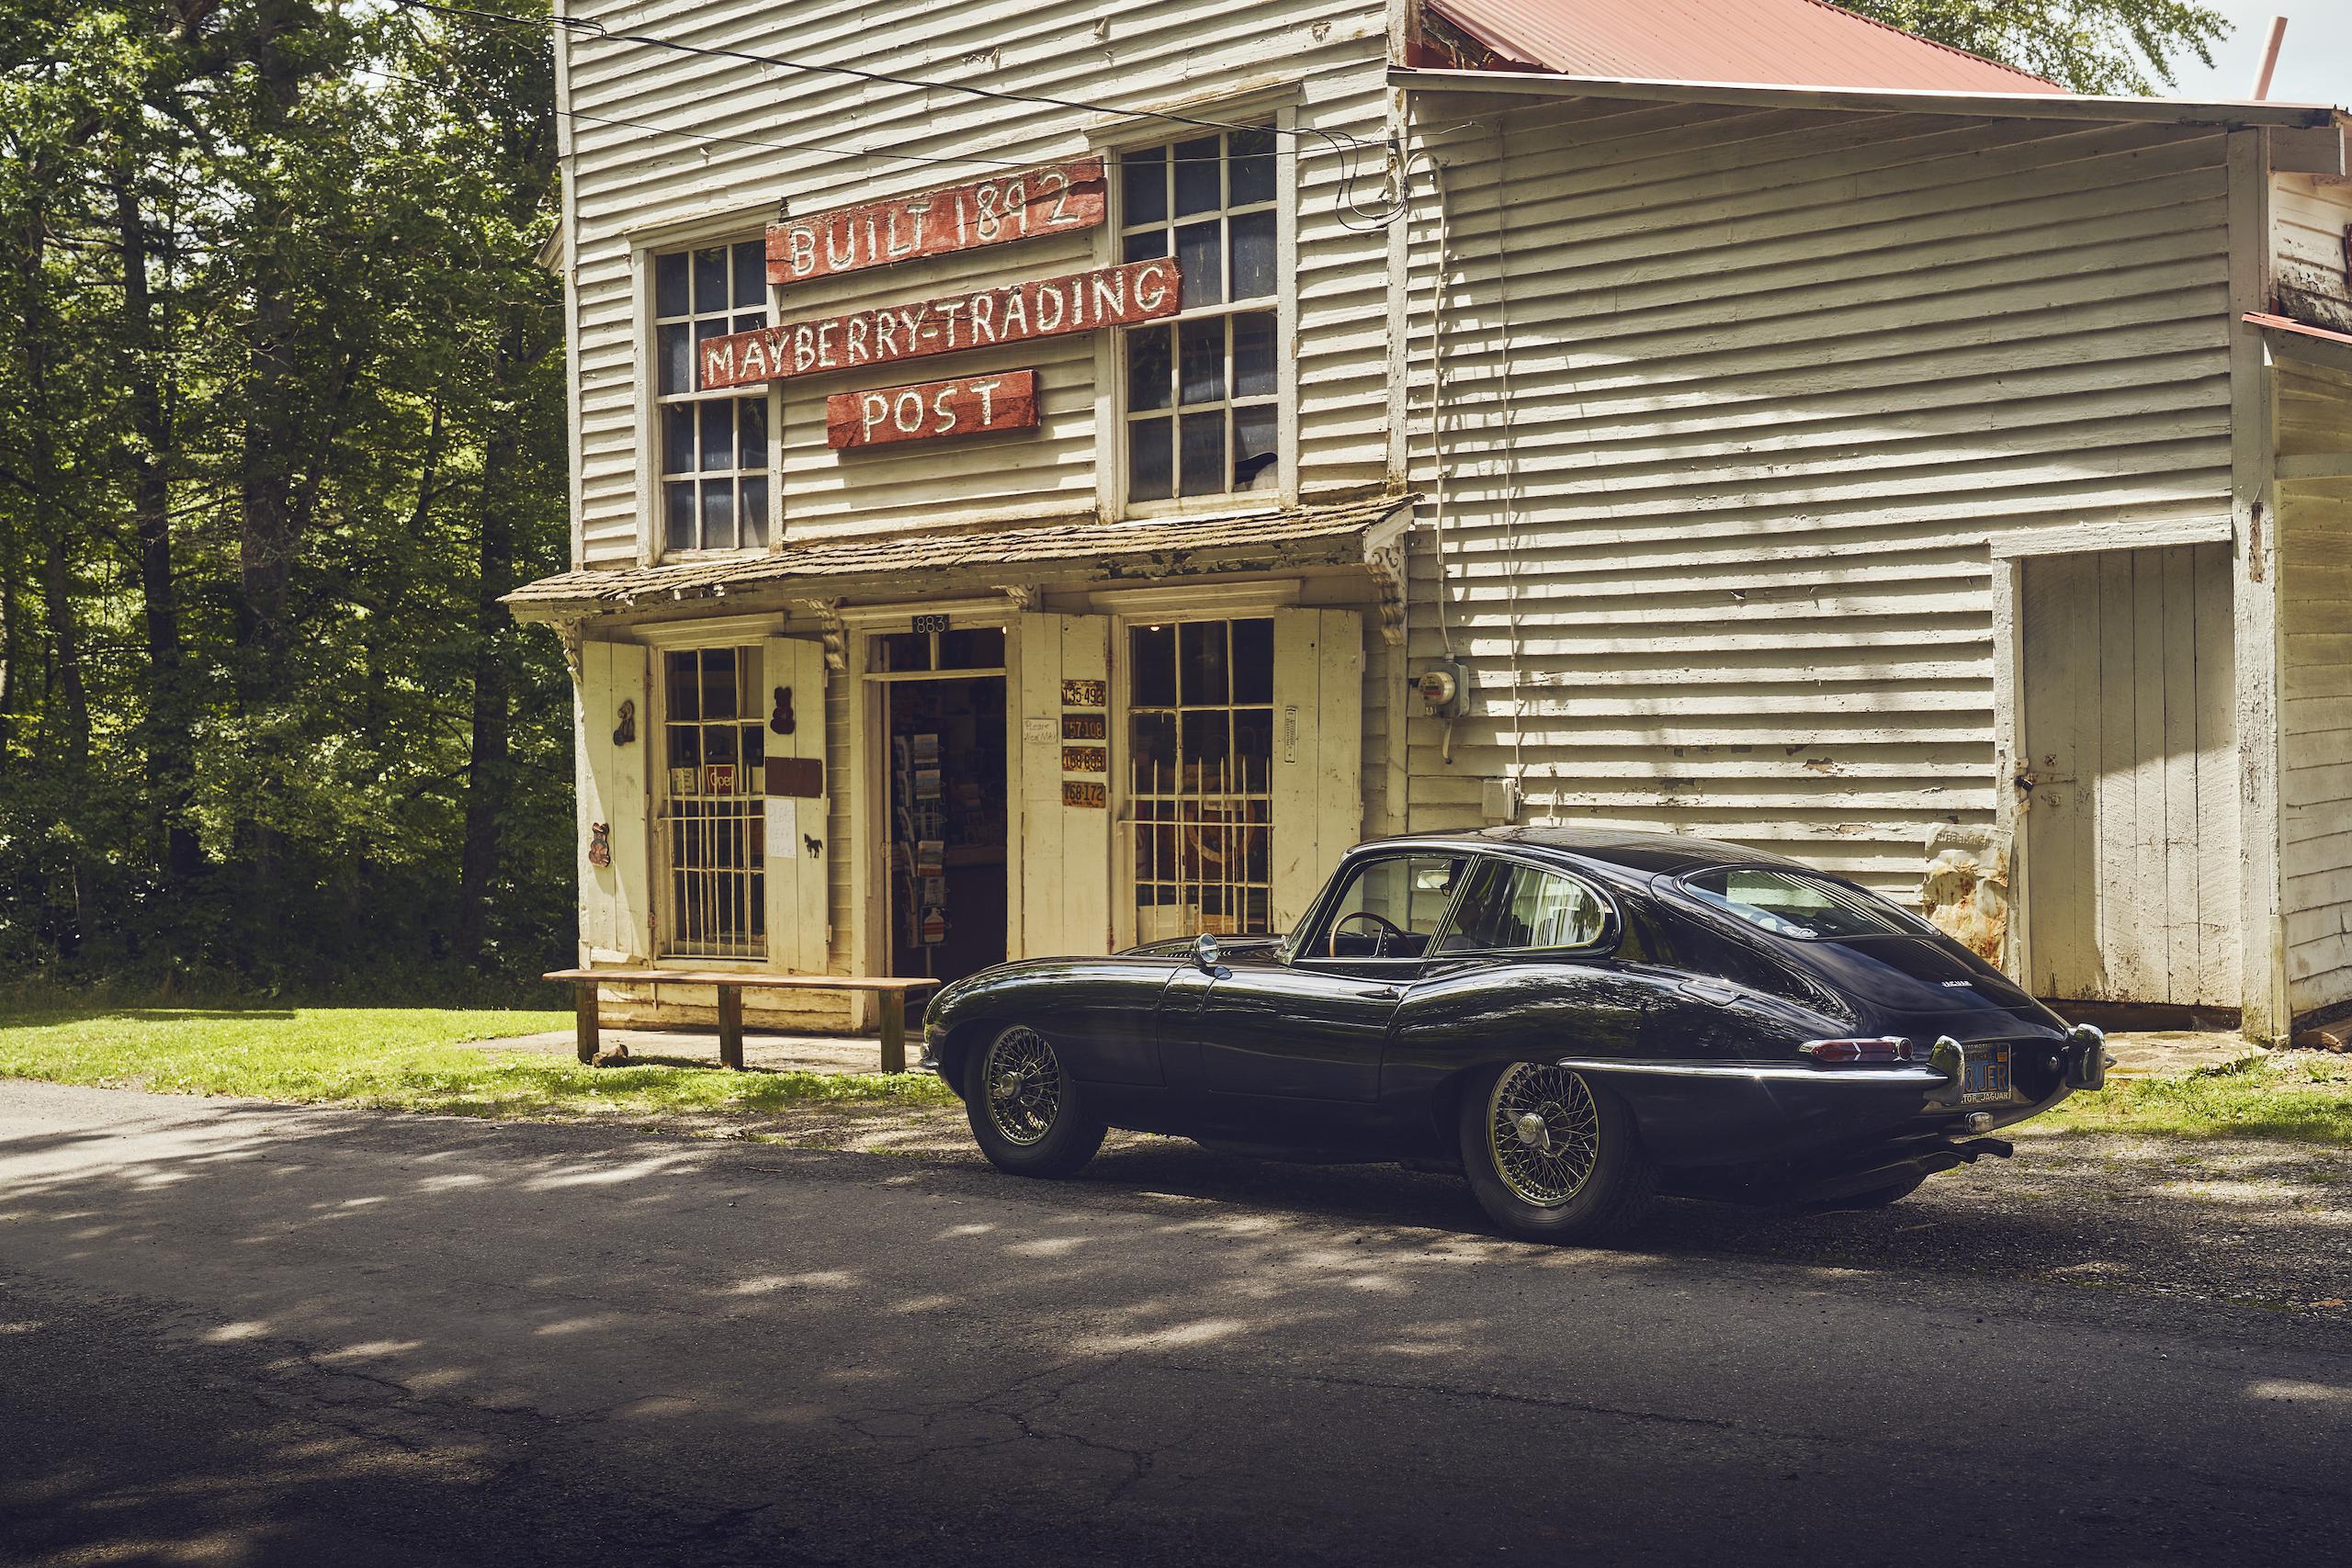 Jaguar E-Type trading post parked